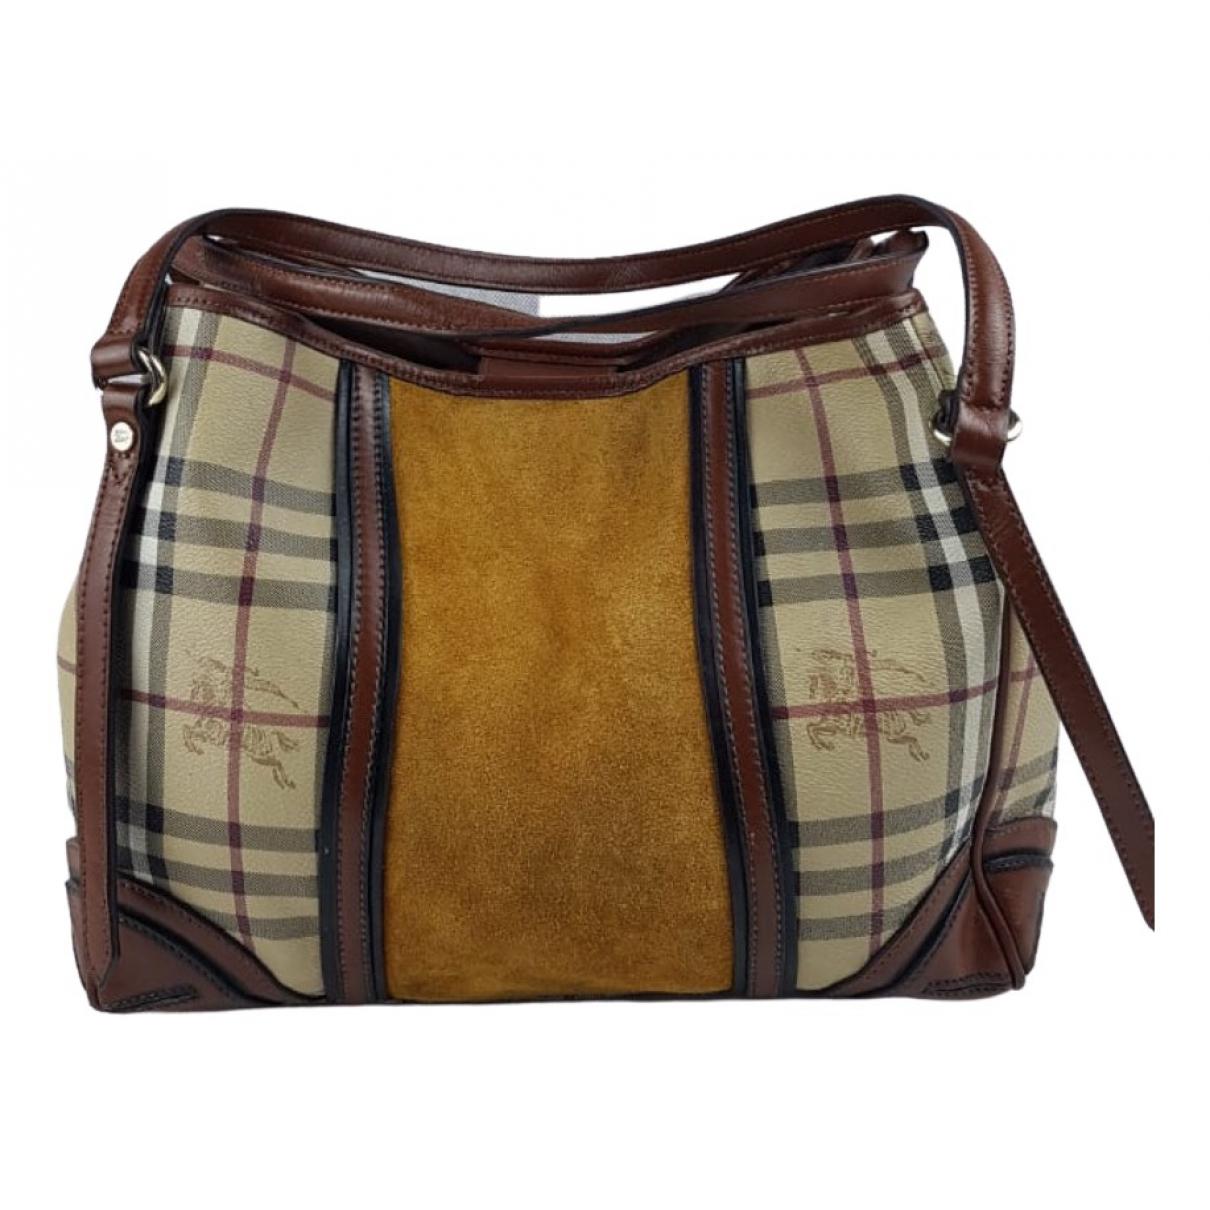 Burberry \N Brown Leather handbag for Women \N